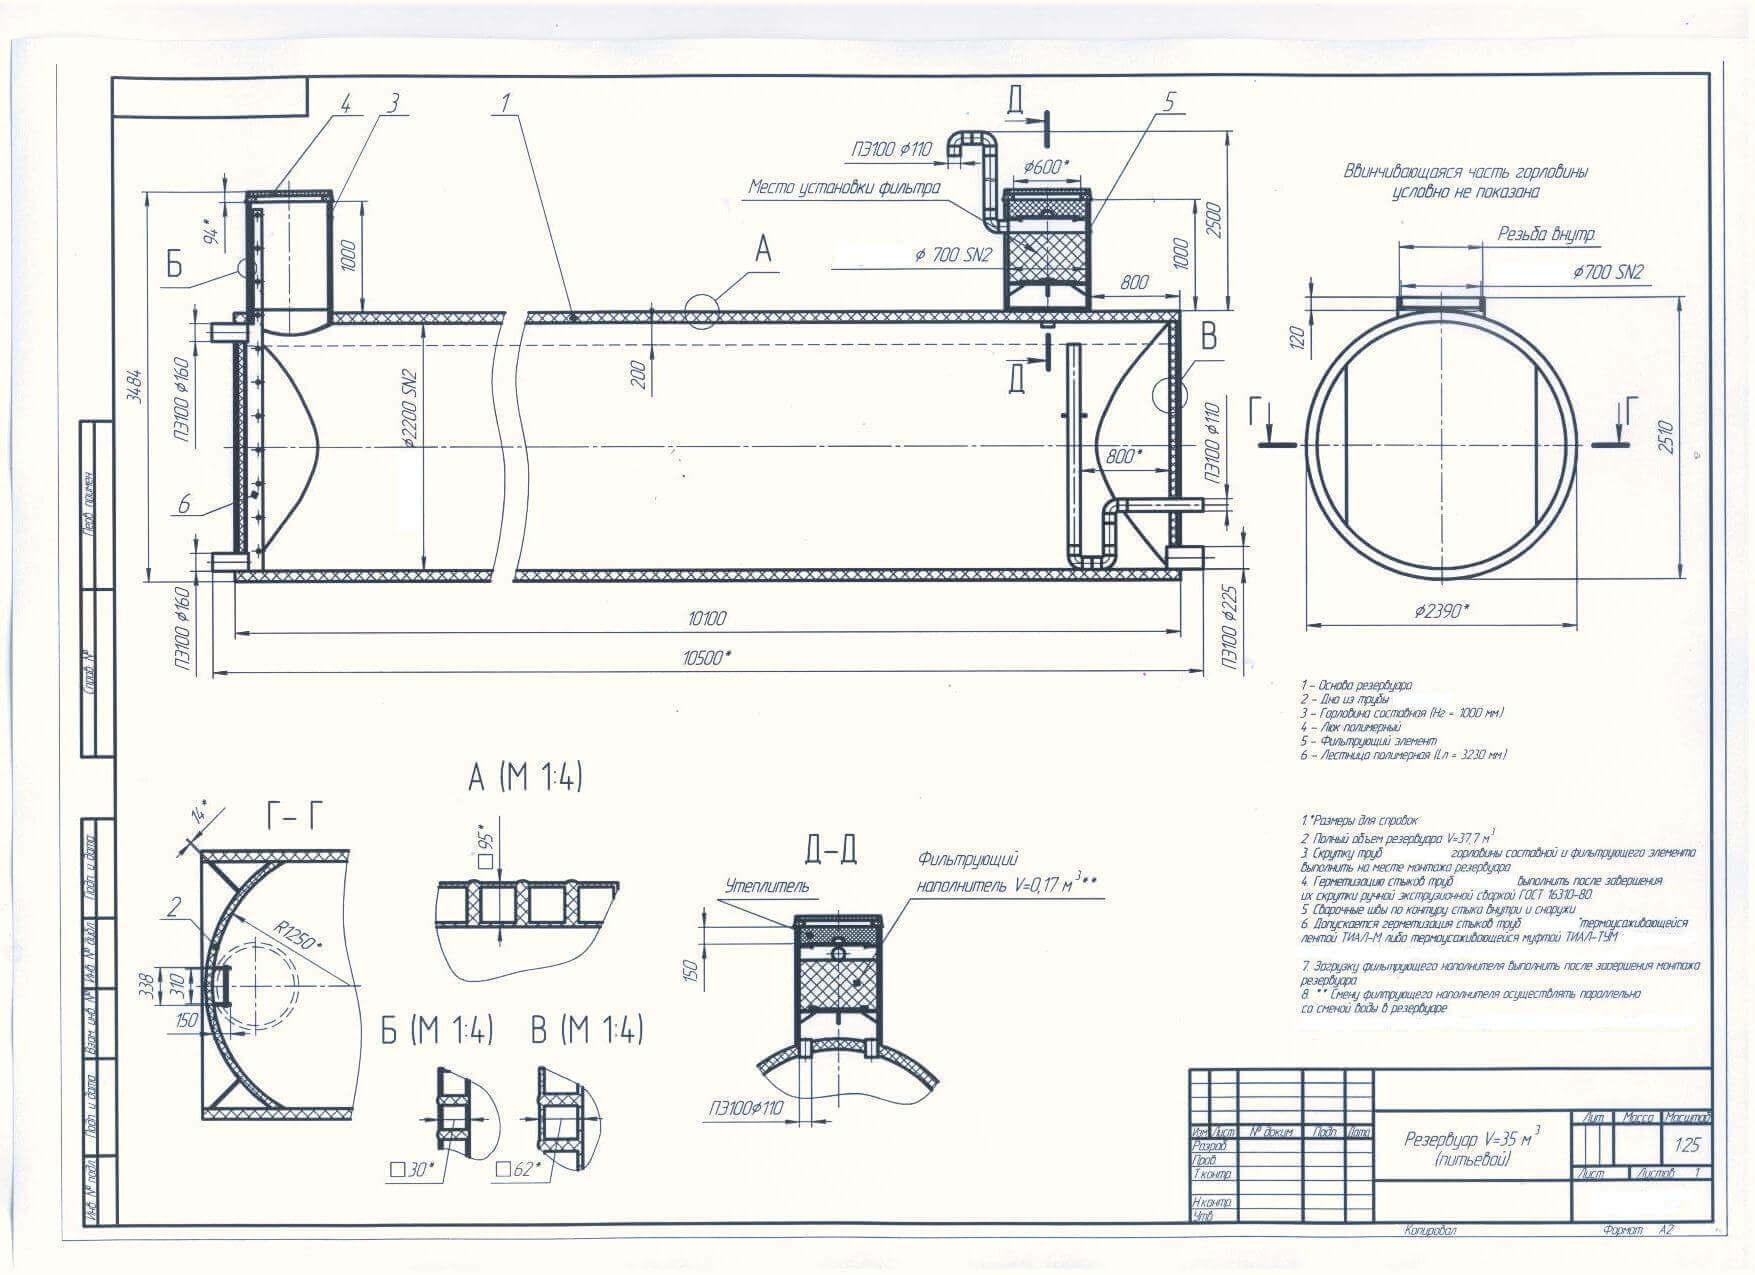 rezervuary i emkosti stekloplastik 10 Резервуары и емкости (стеклопластик)